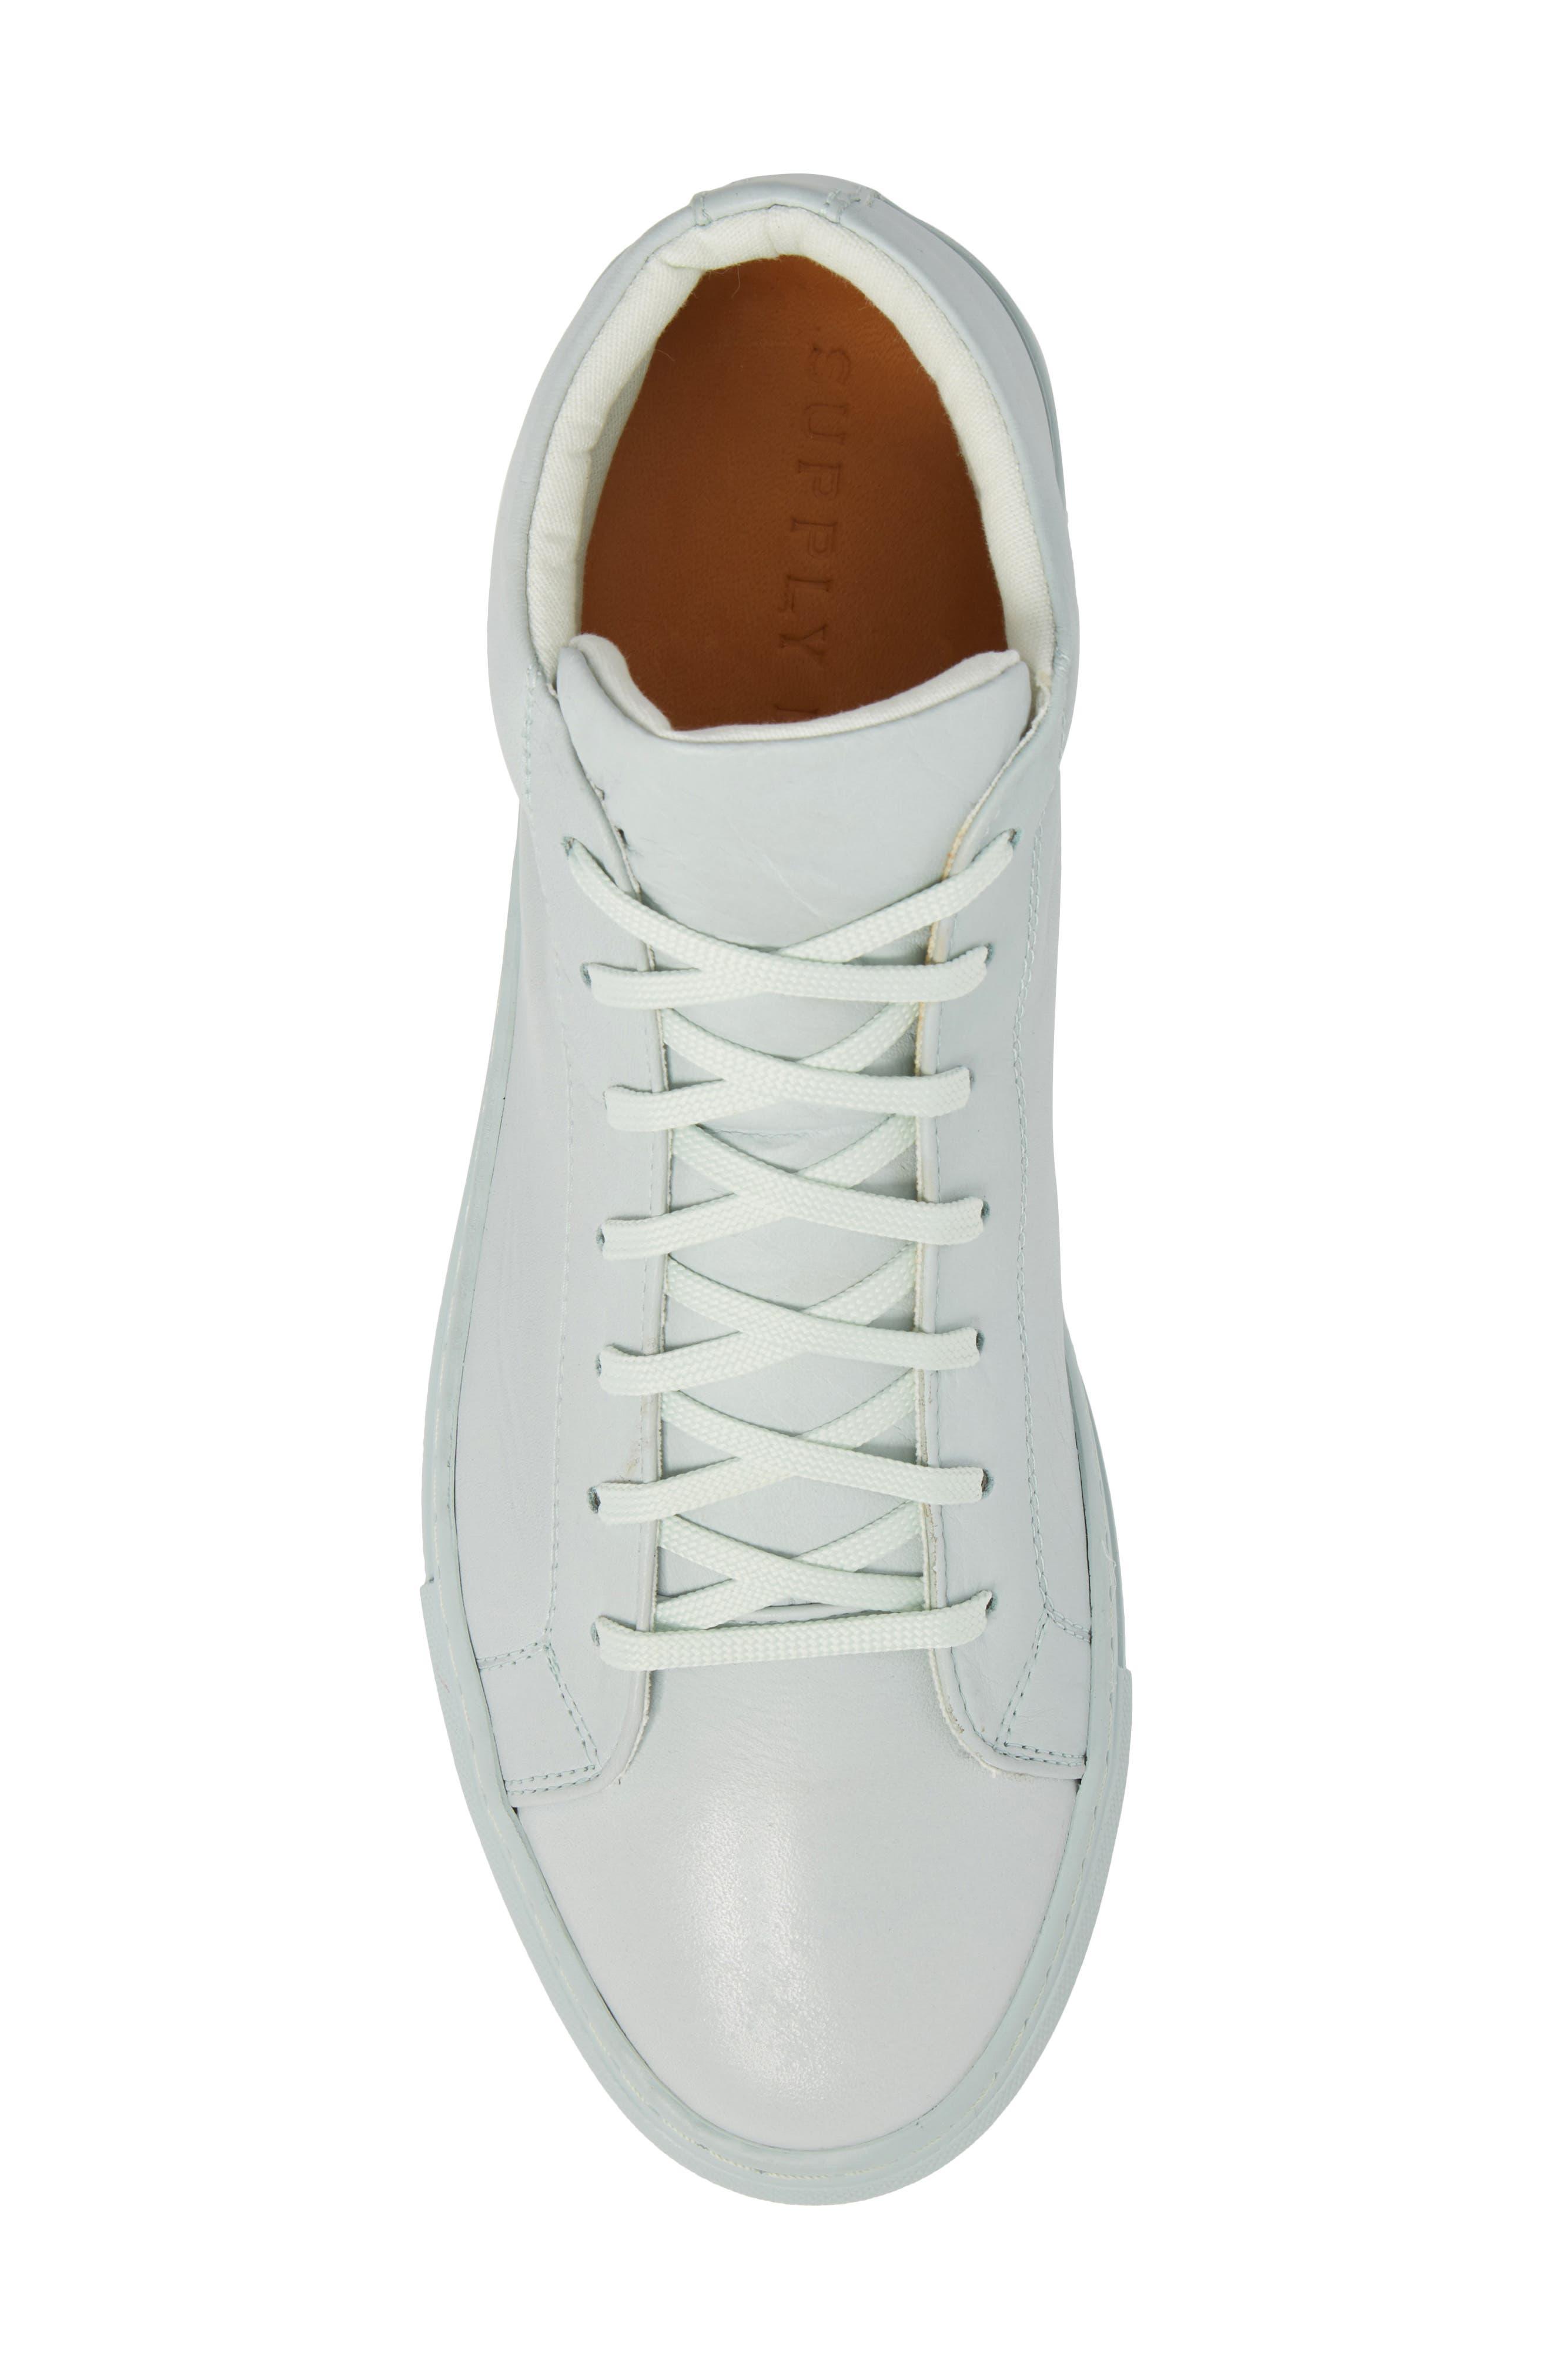 Lexington Mid Top Sneaker,                             Alternate thumbnail 5, color,                             Mint Green Leather